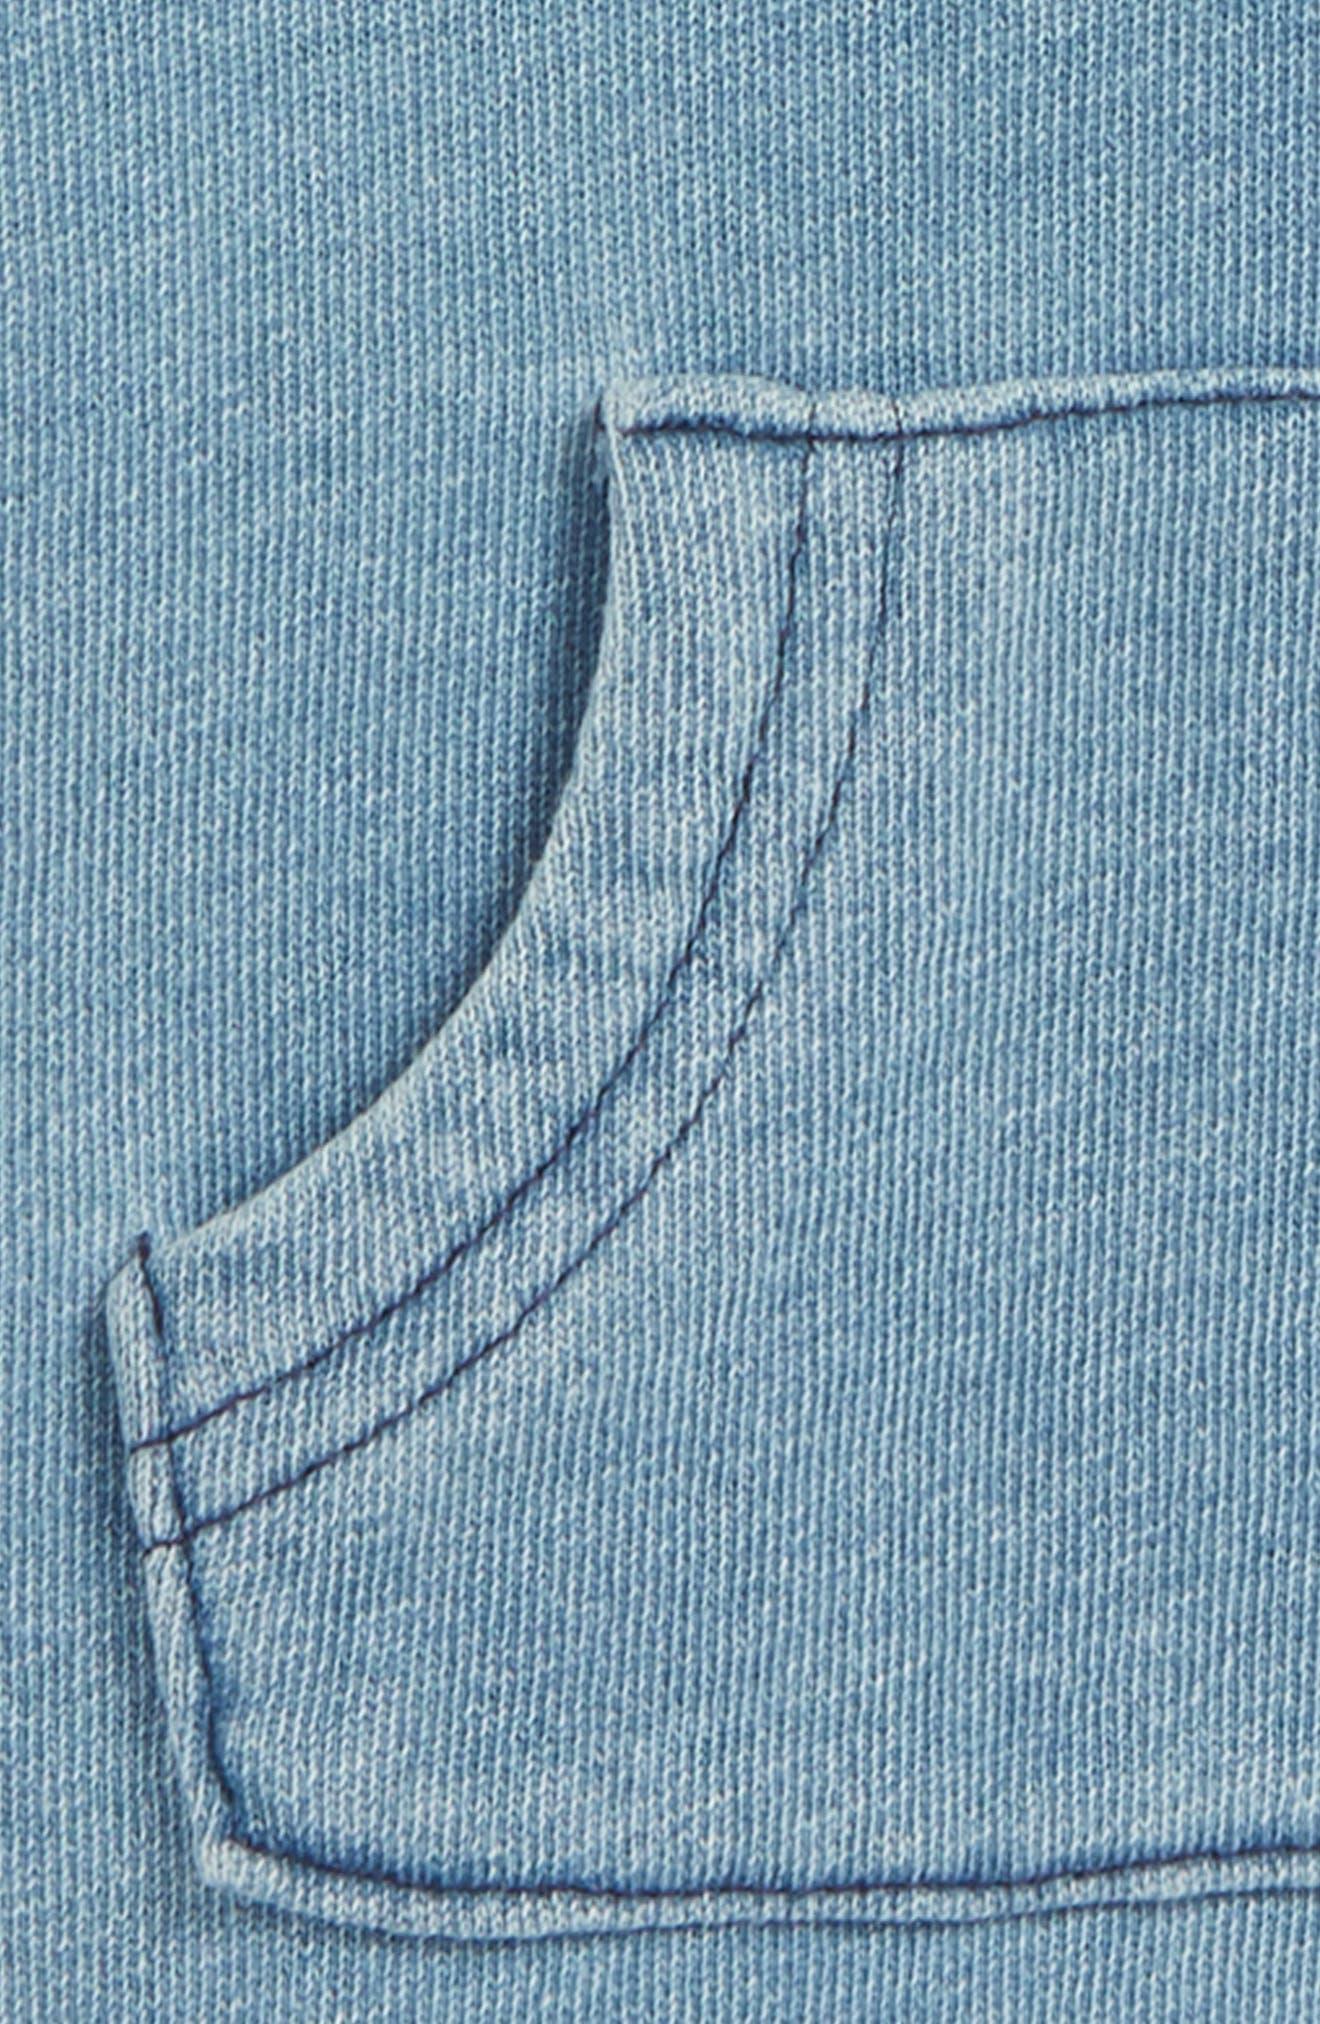 Hooded Pullover,                             Alternate thumbnail 2, color,                             Blue Indigo